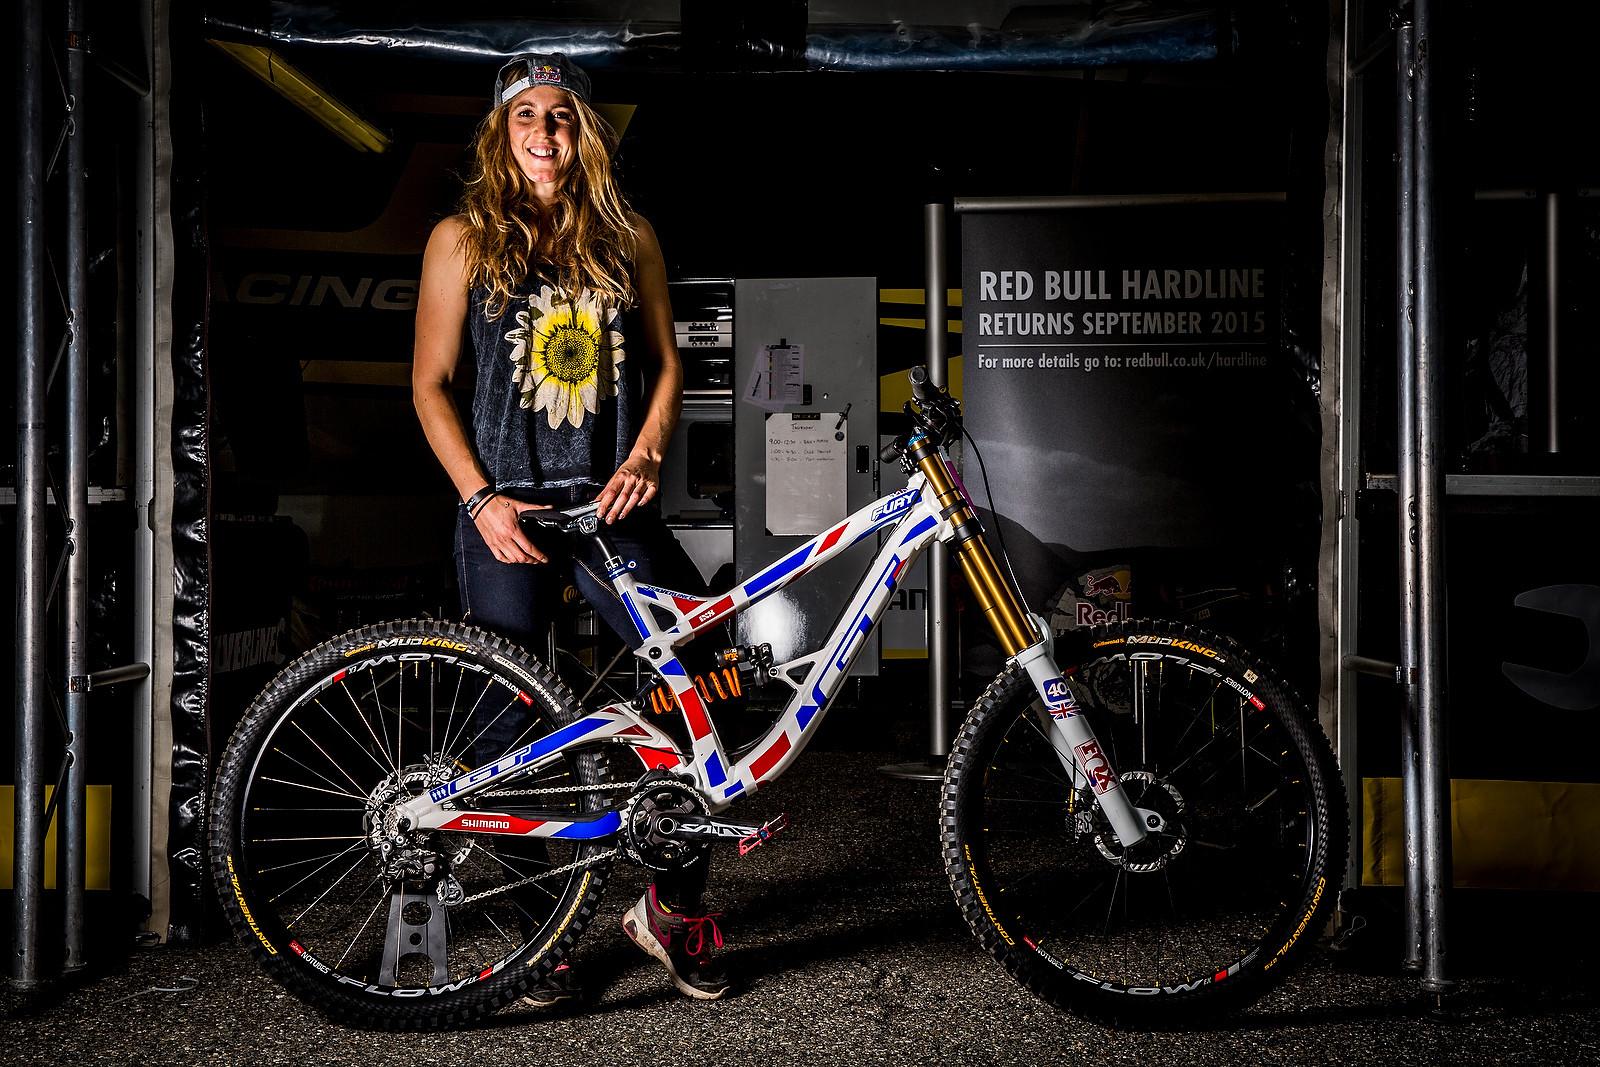 Winning Bike Rachel Atherton S Gt Fury For World Champs